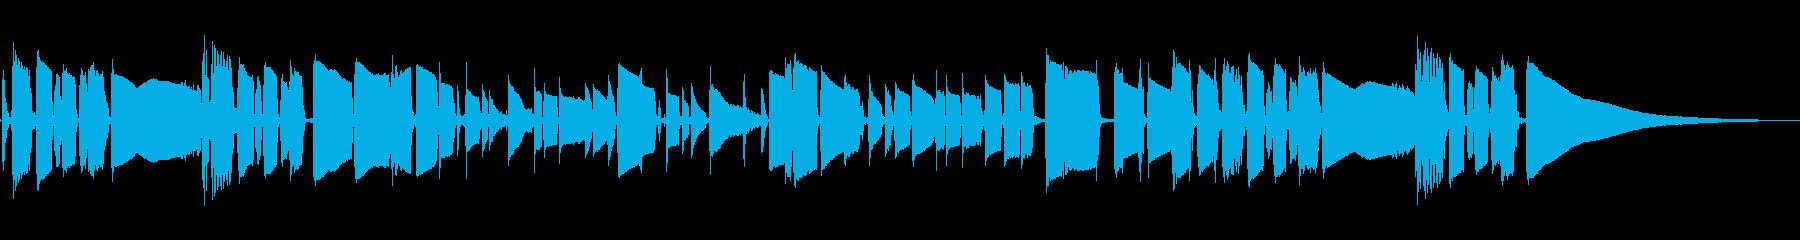 T.V.コンテンポラリーインスト気...の再生済みの波形